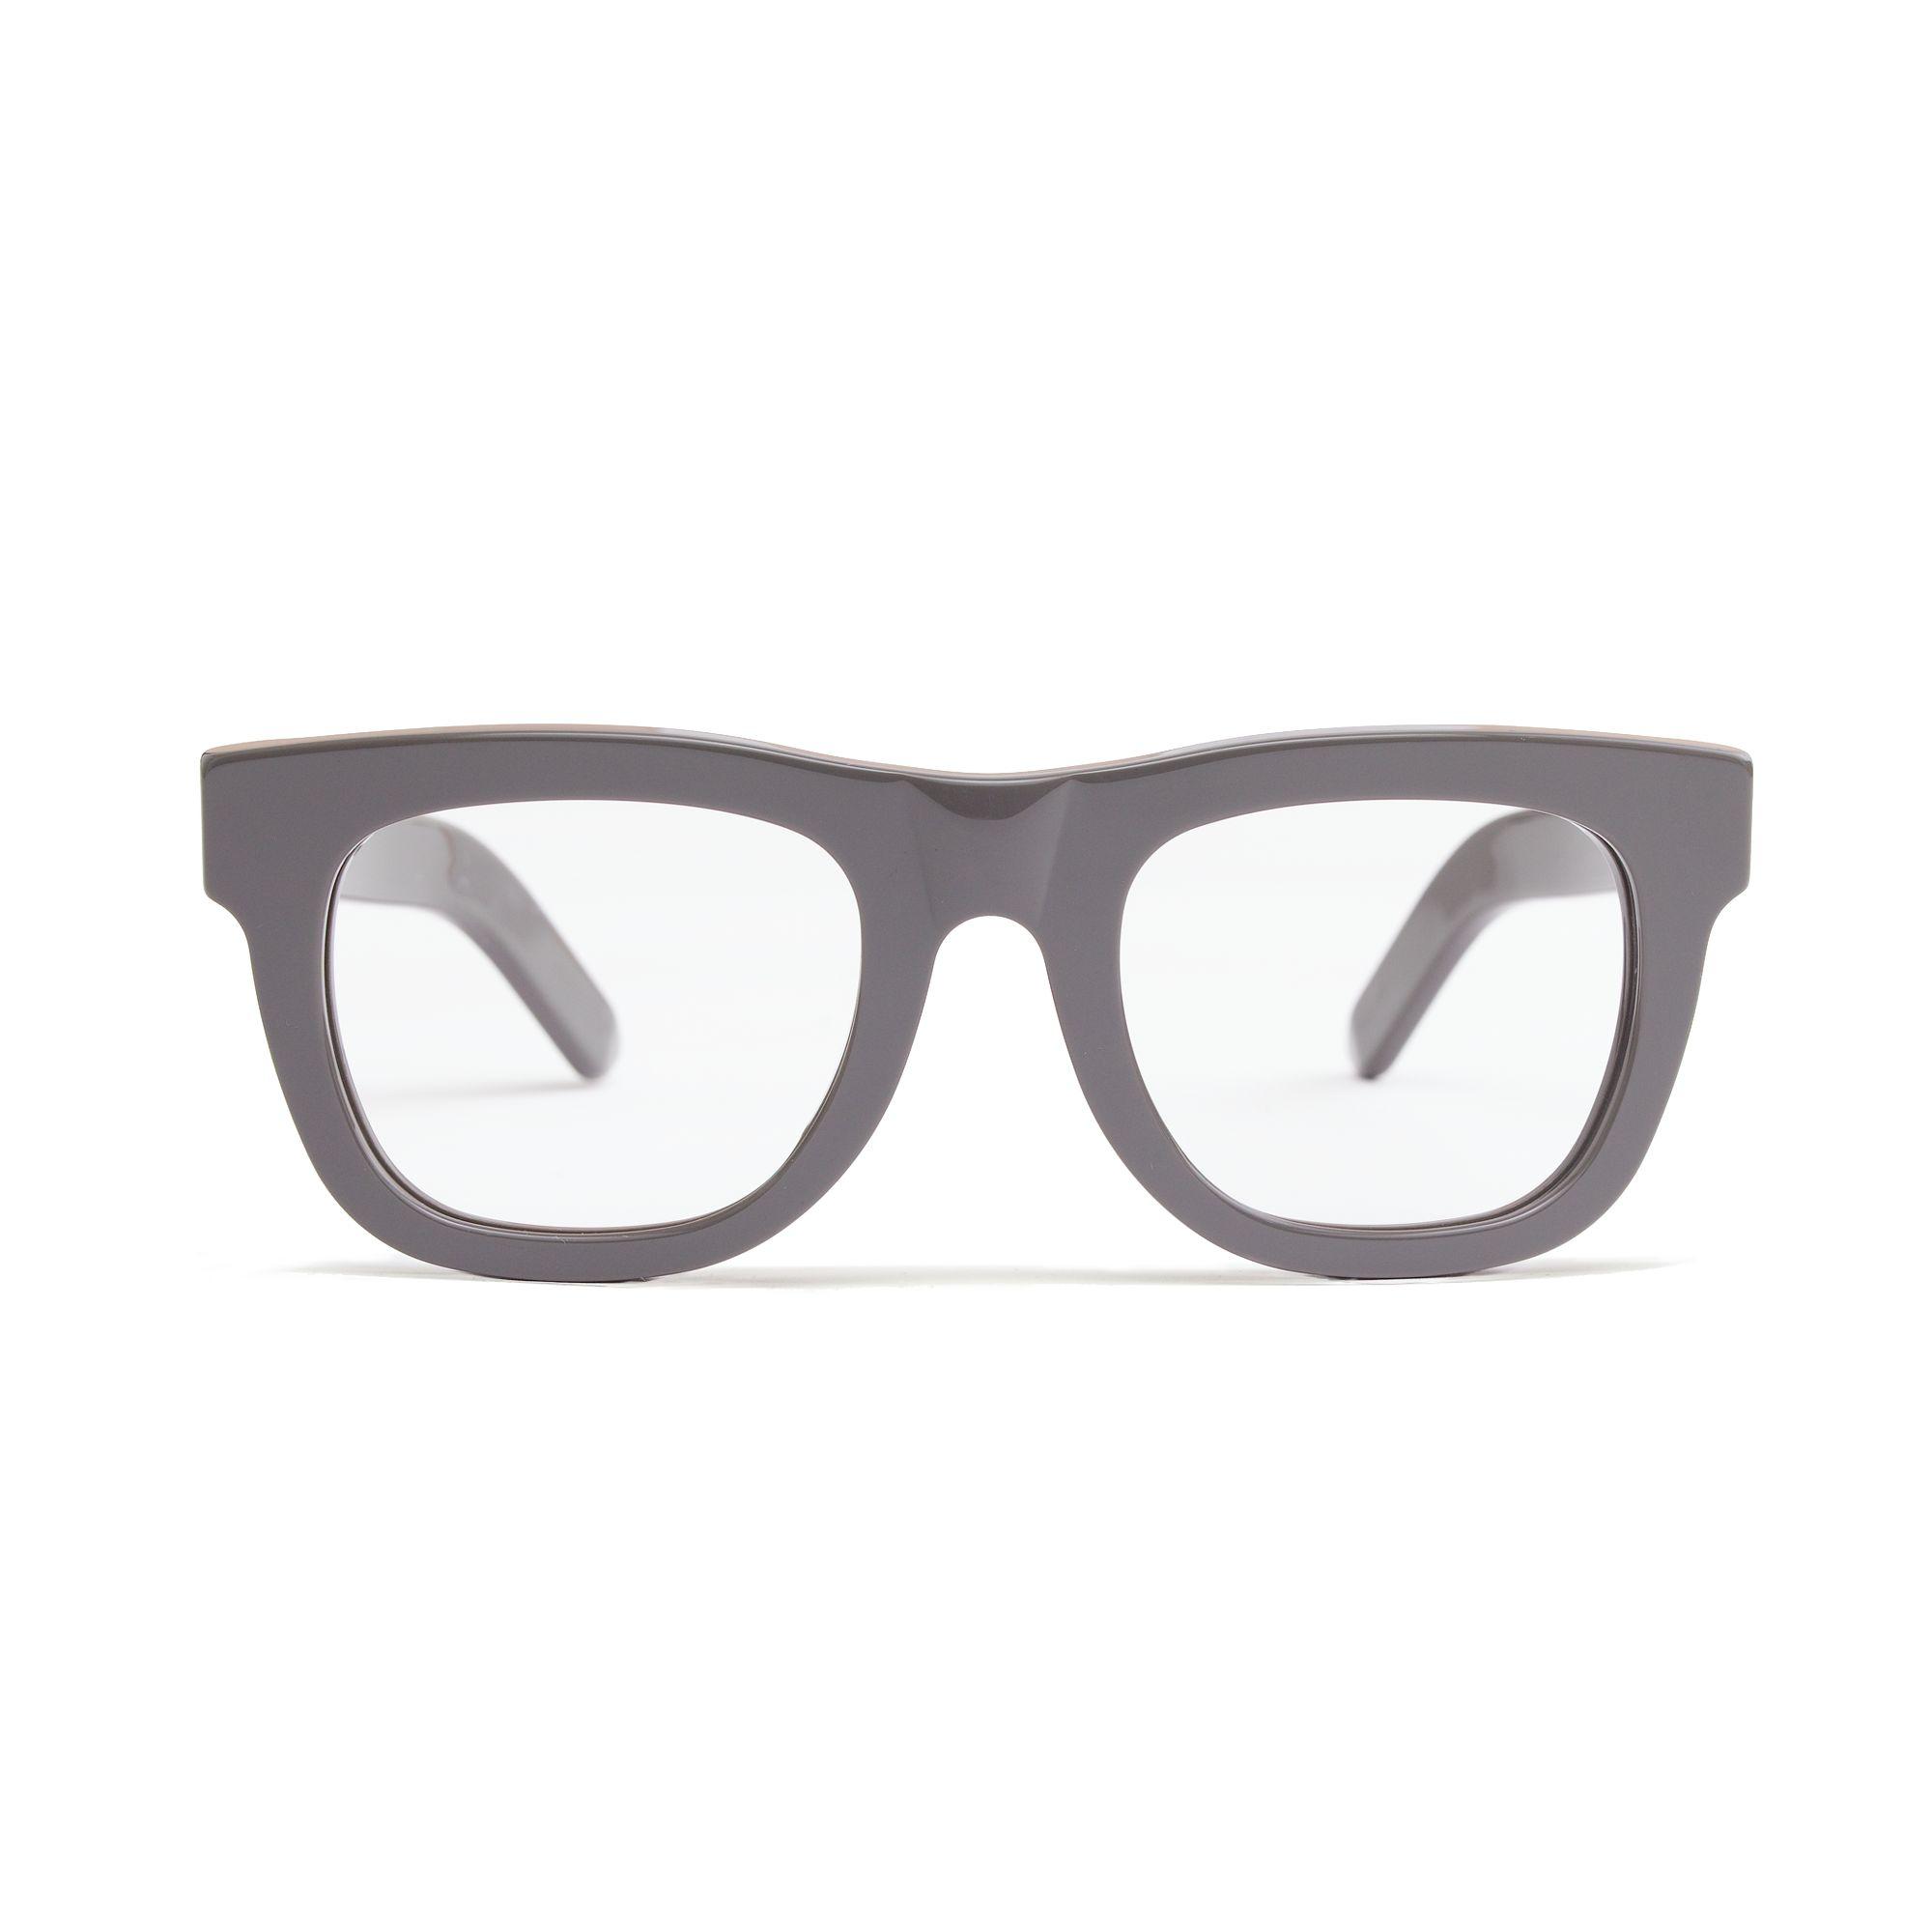 madewell ciccio eyeglasses in gray lyst